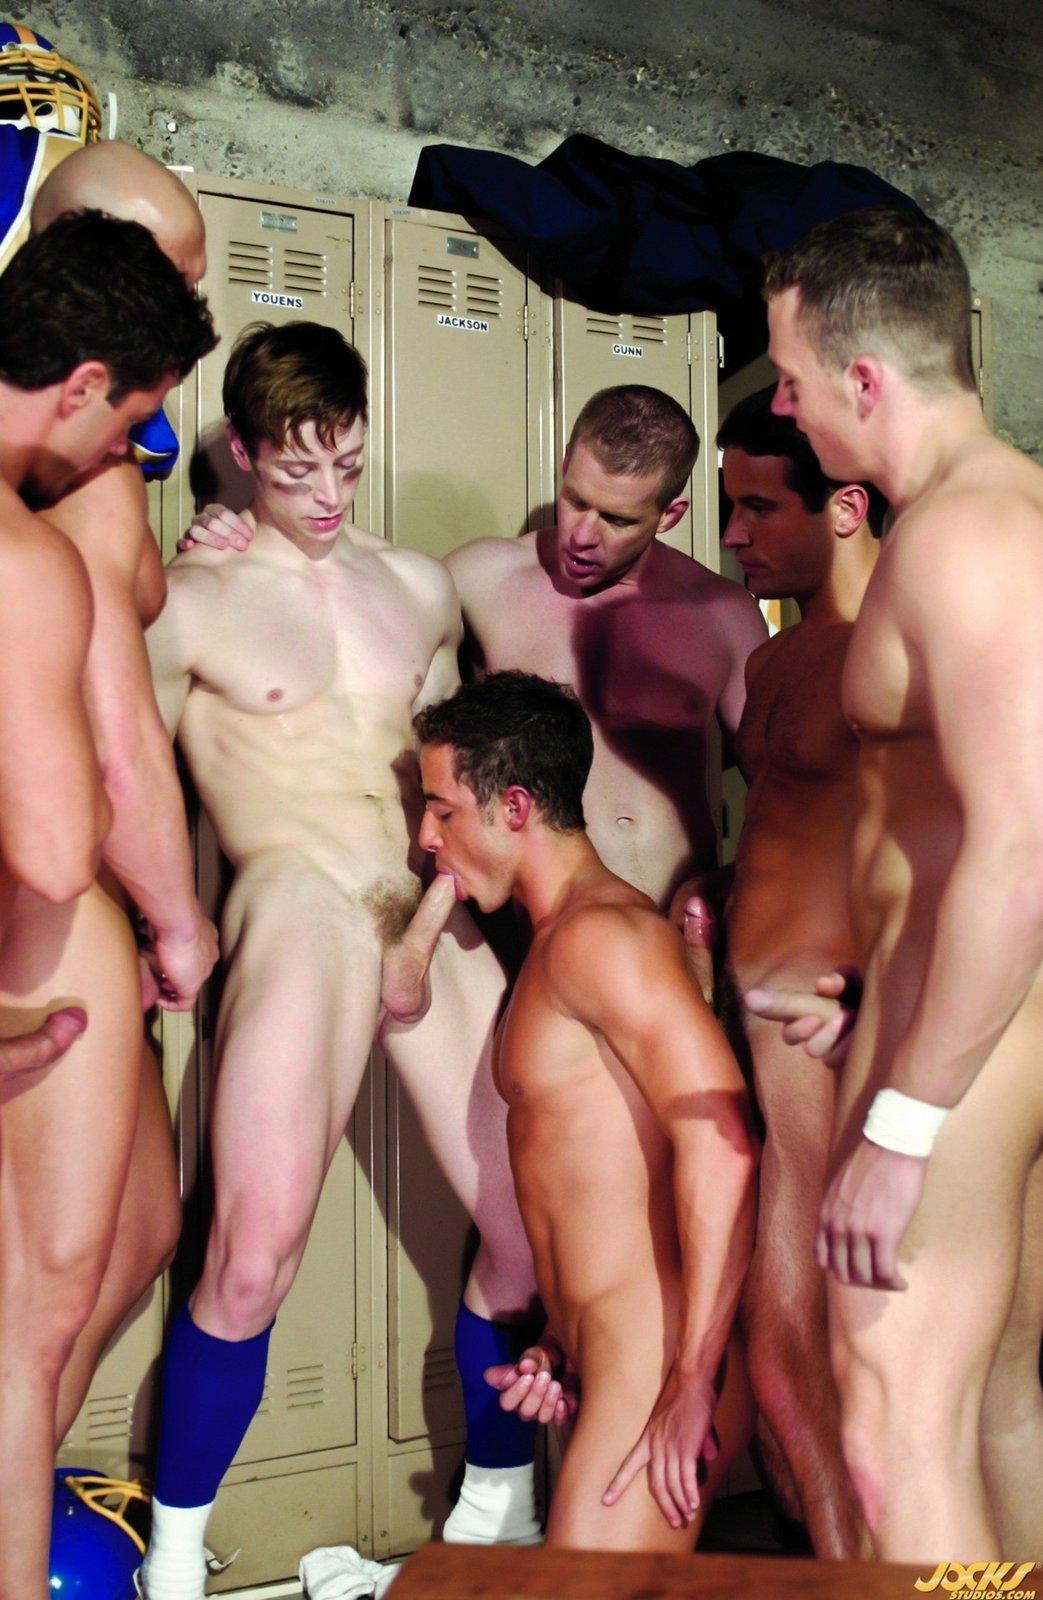 frat-boys-locker-room-pics-anal-martha-stewart-ass